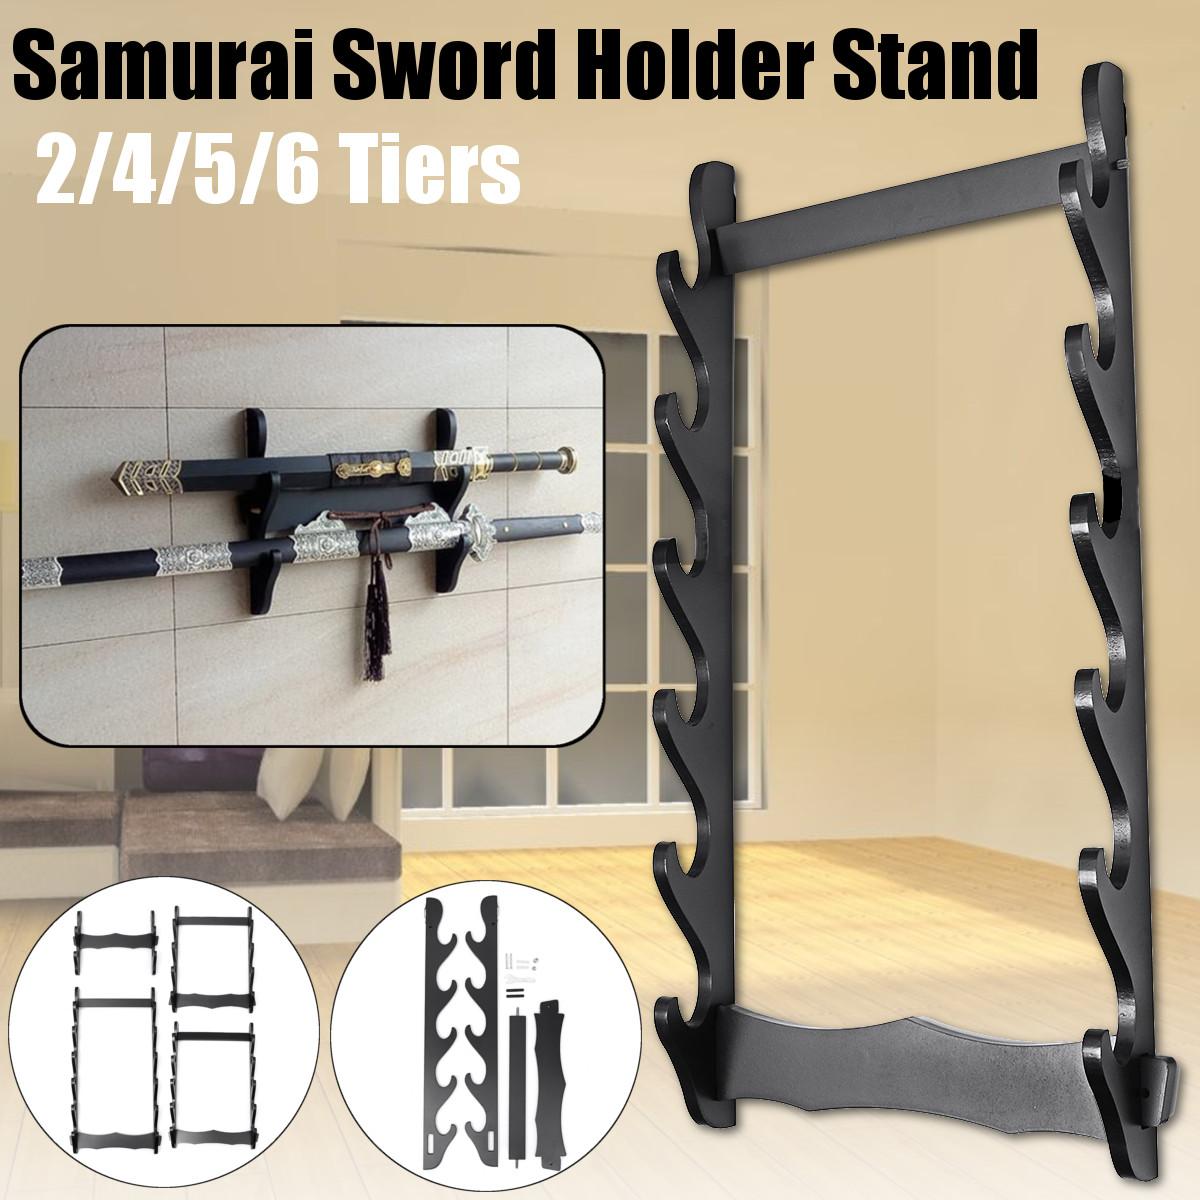 1/2/3/4/5/6 Tier Holder Wall Mount Samurai Stand Display Katana Hanger Rack Support 1